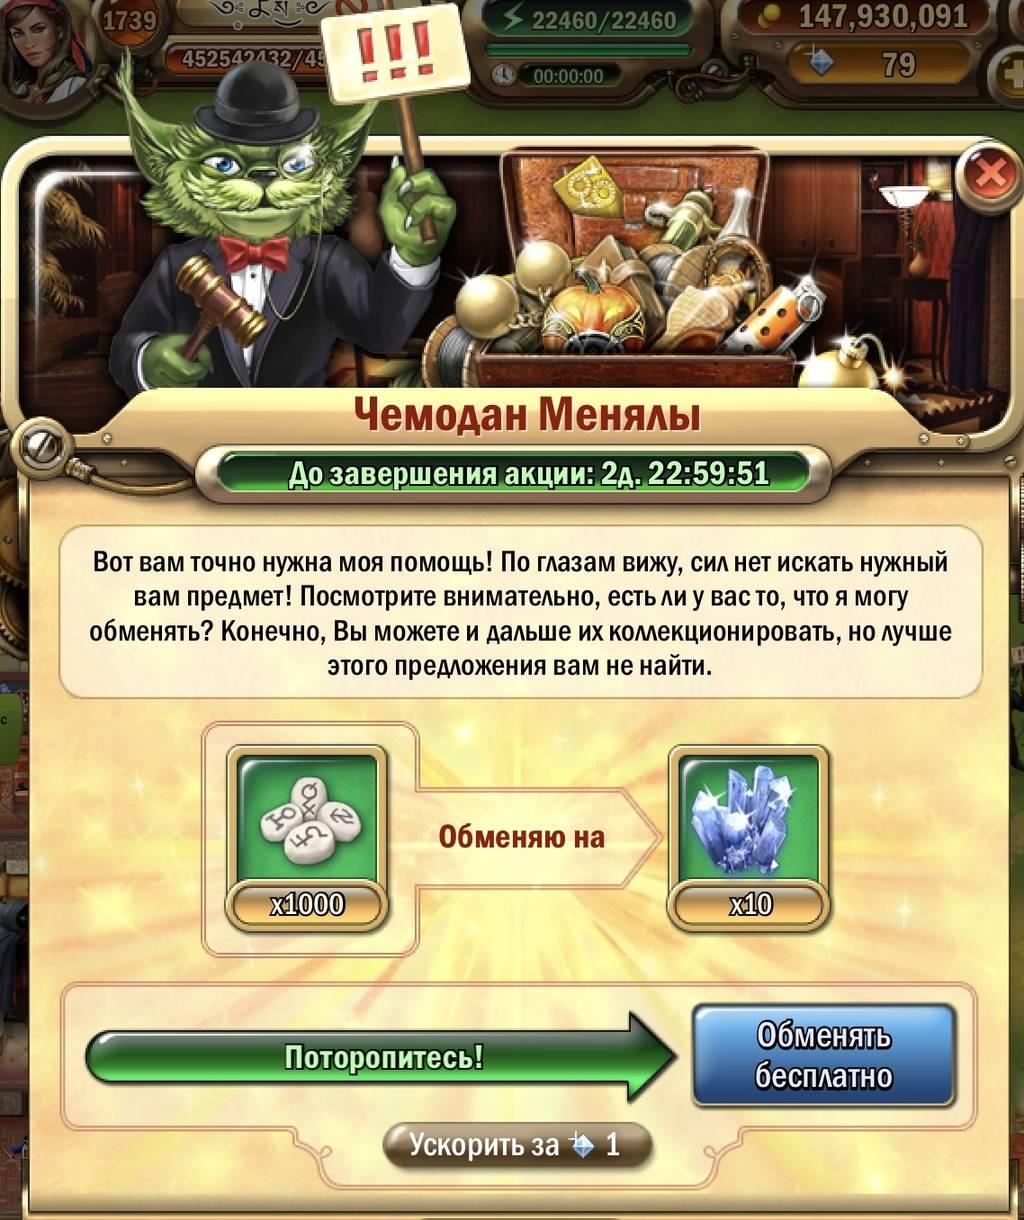 http://s5.uploads.ru/59ZVC.jpg